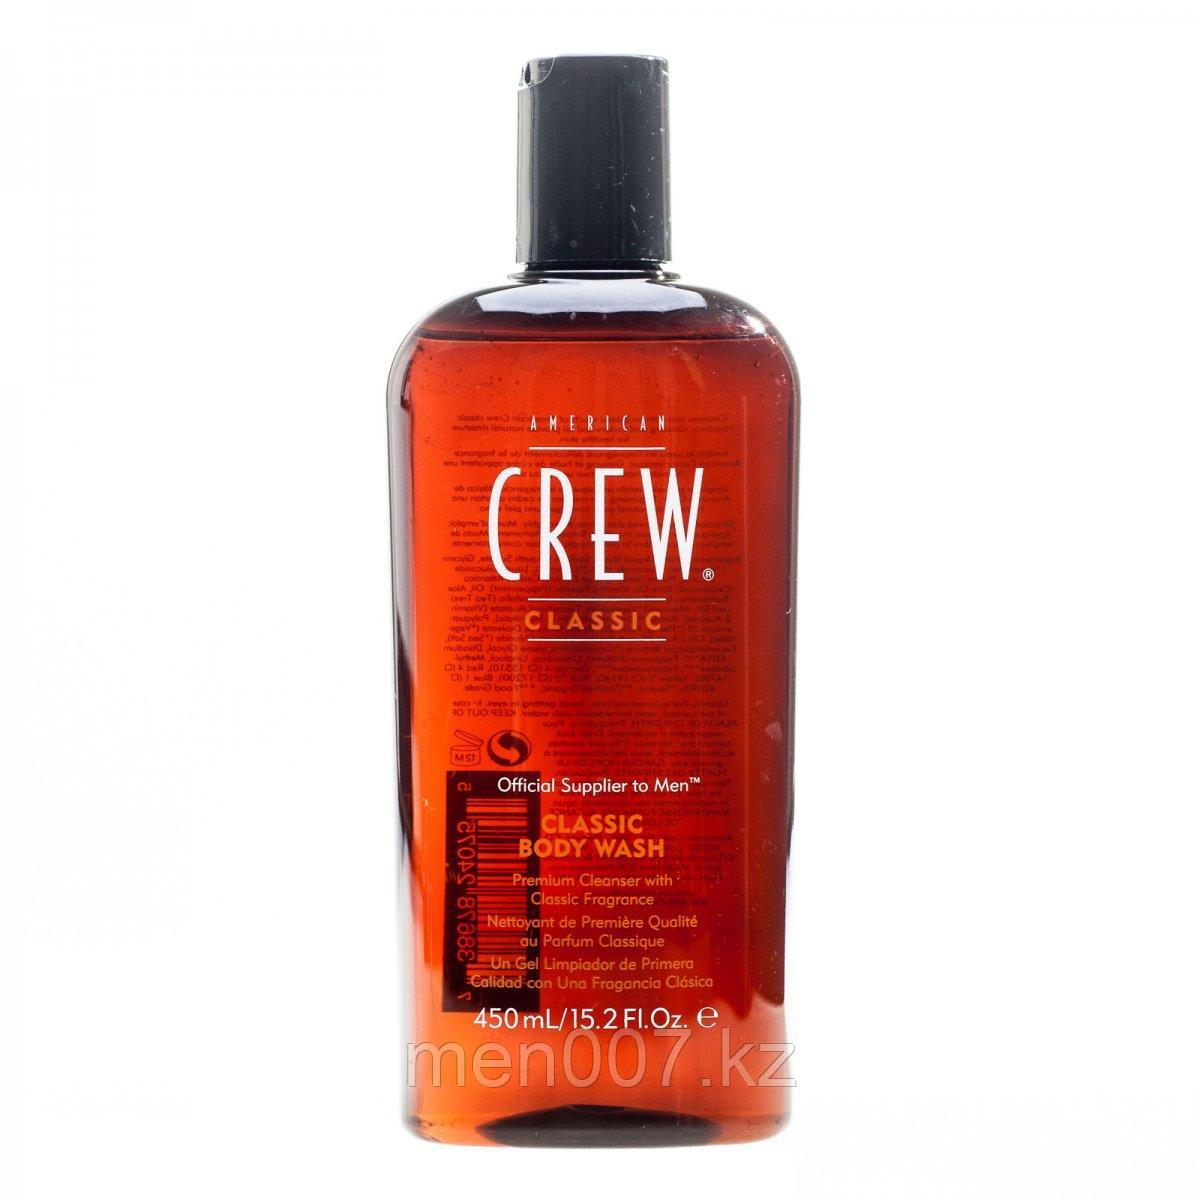 American Crew Classic (Гель для душа) 450 мл